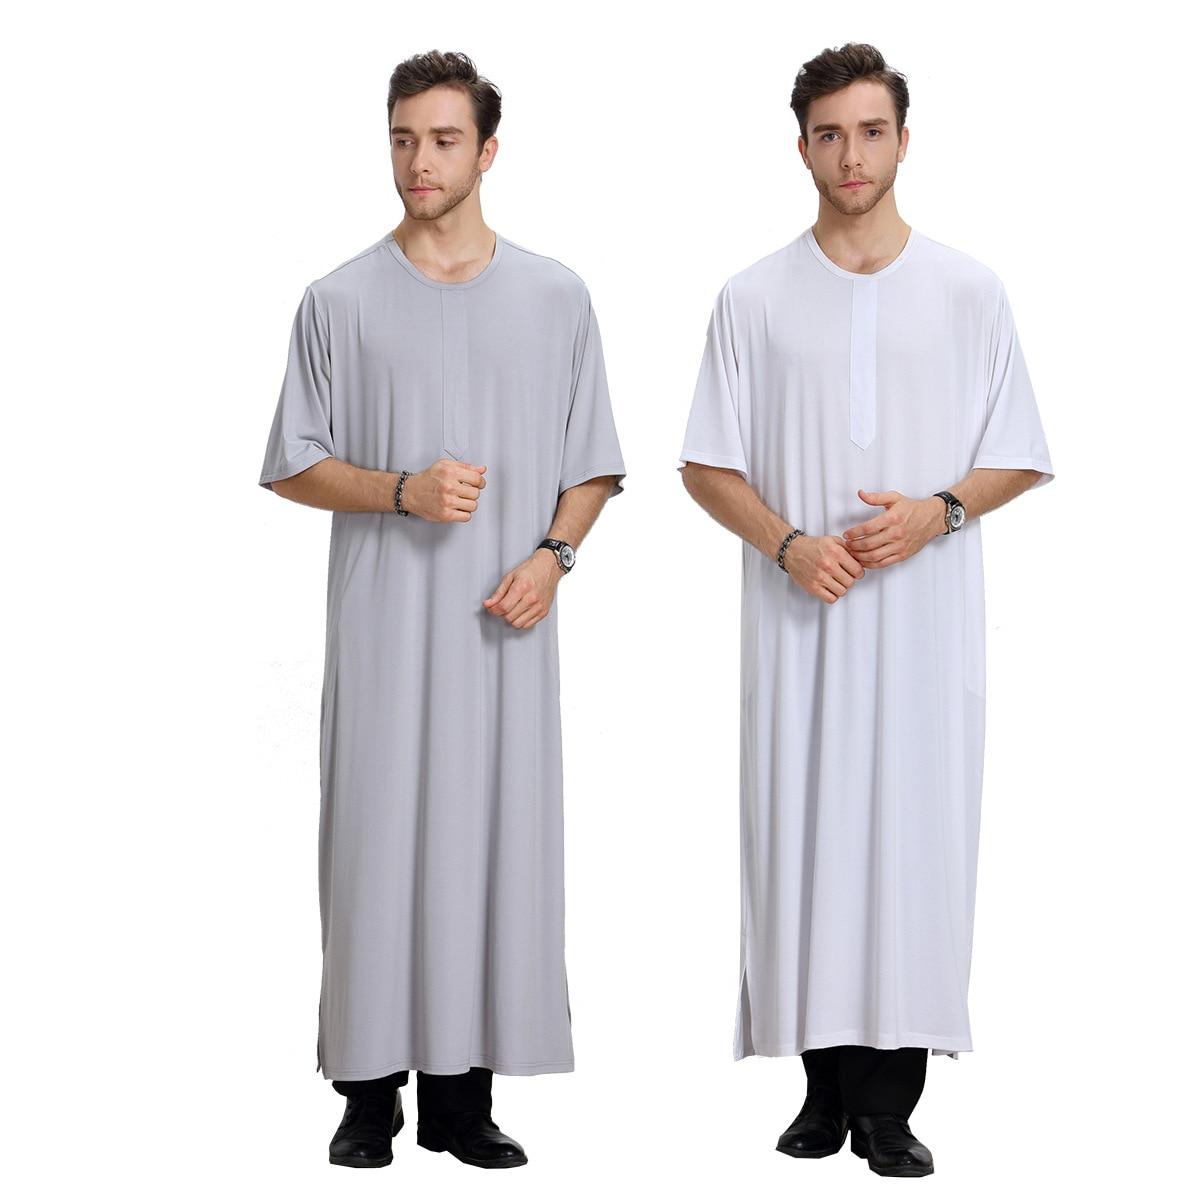 Malaysia Muslim Arab Middle East Capri Crew Neck MEN'S Robe Muslim Formal Dress Th807